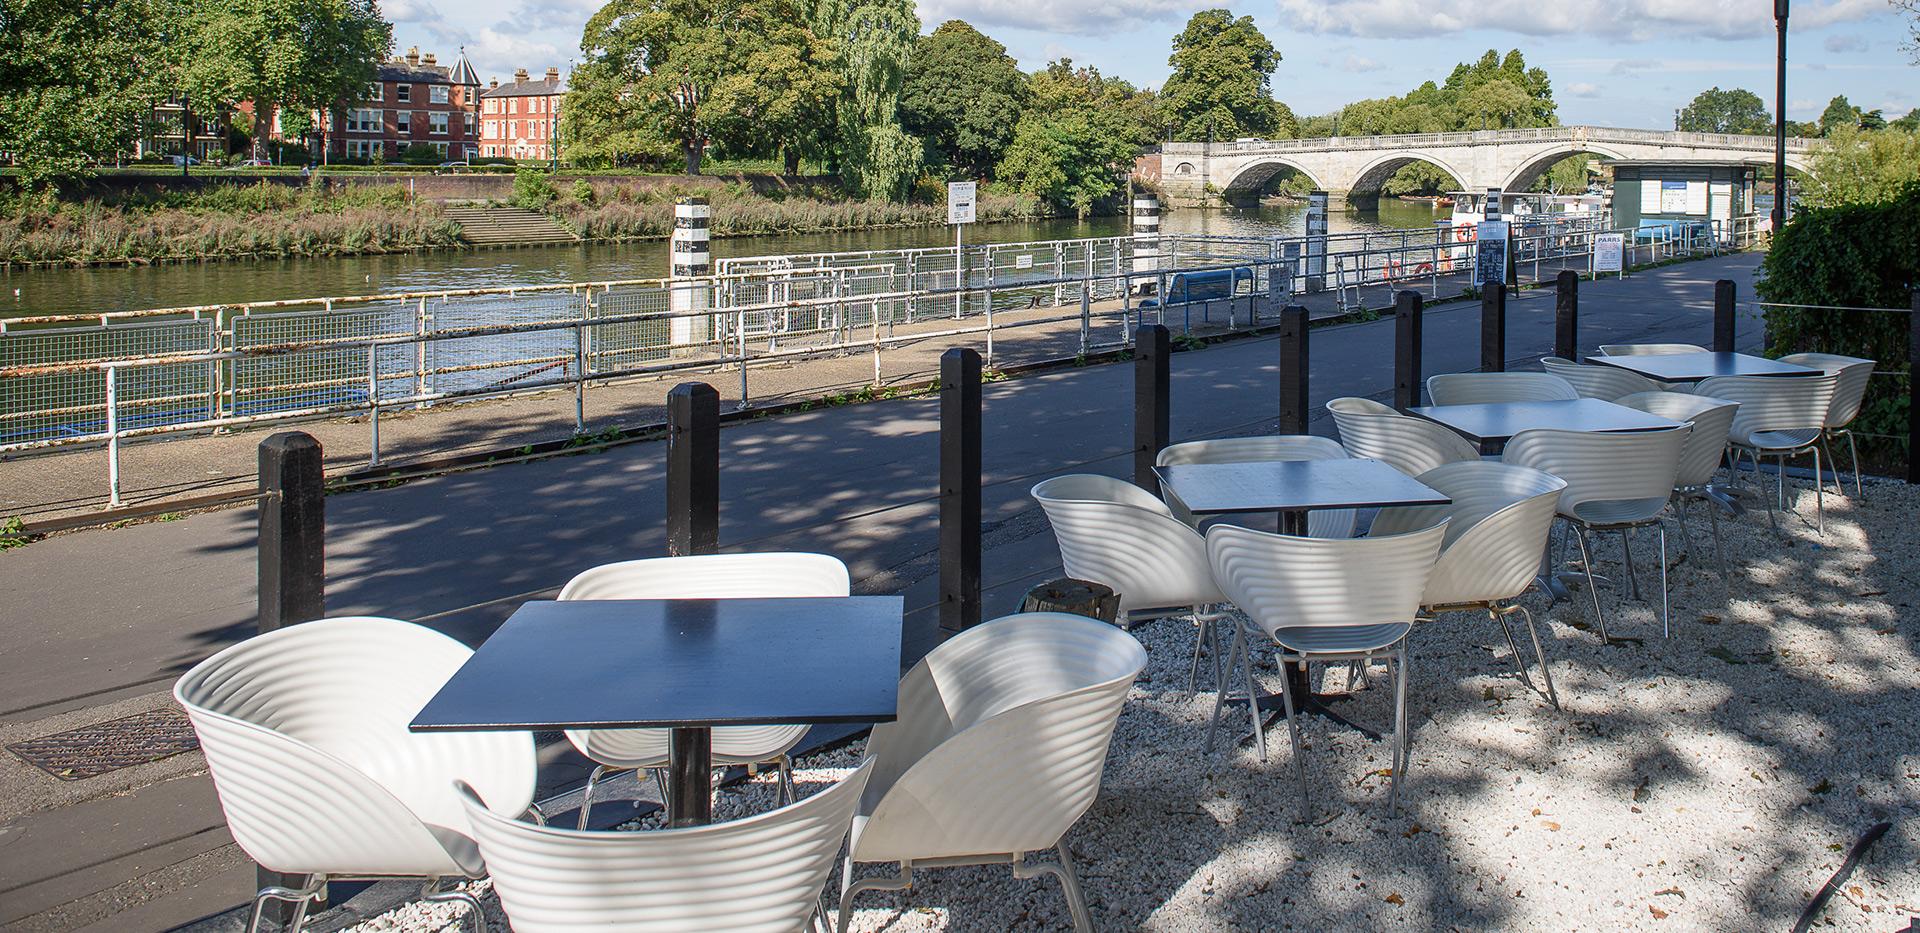 St James, Fitzroy Gate, River view